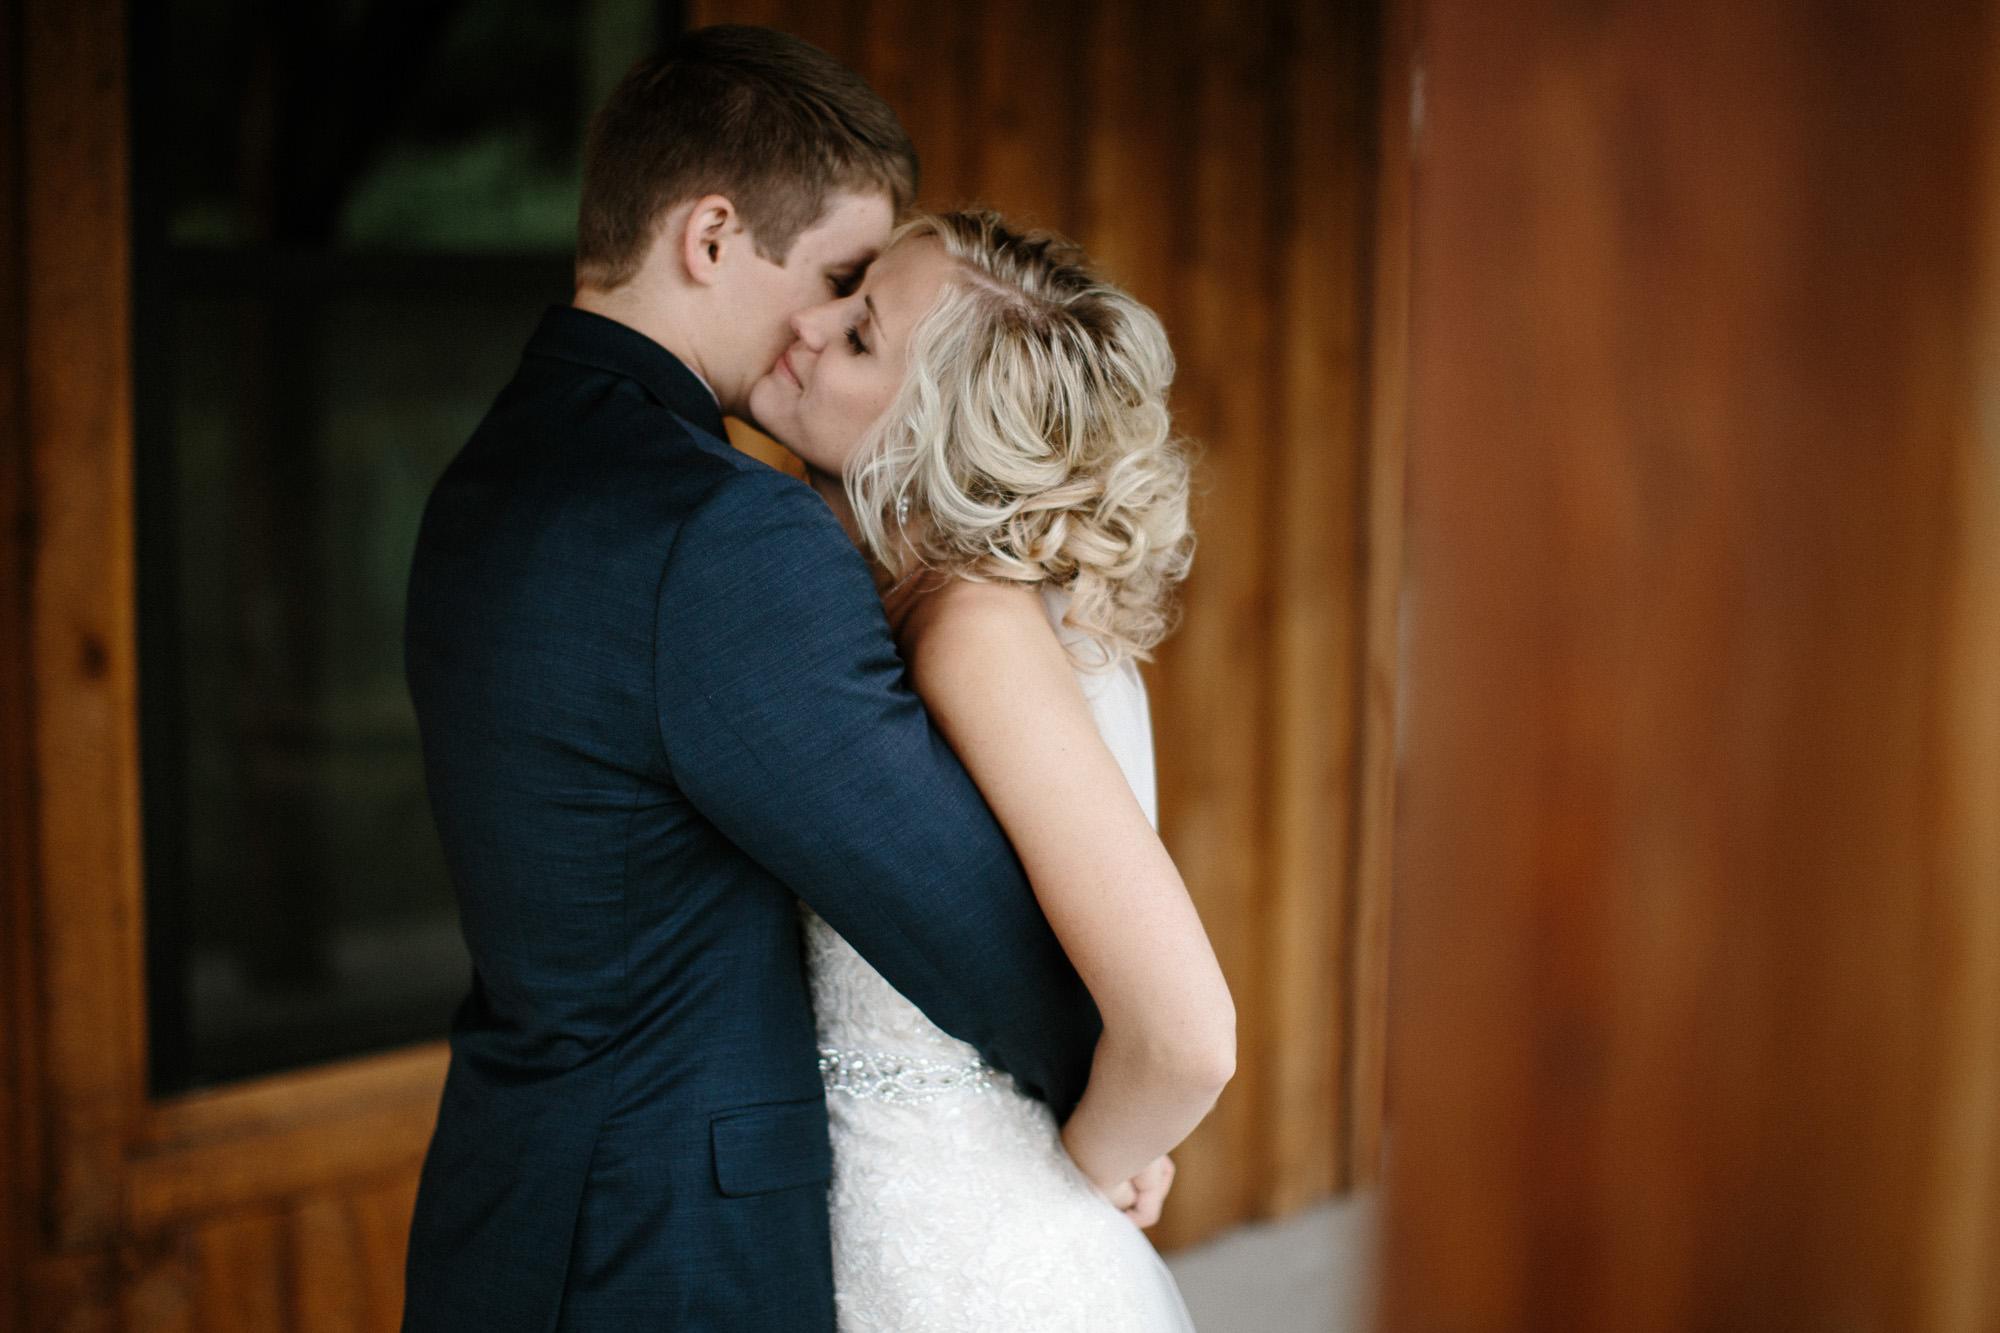 meadow-barn-wedding-sioux-falls-south-dakota-romantic-adventerous-michael-liedtke-photography025.jpg